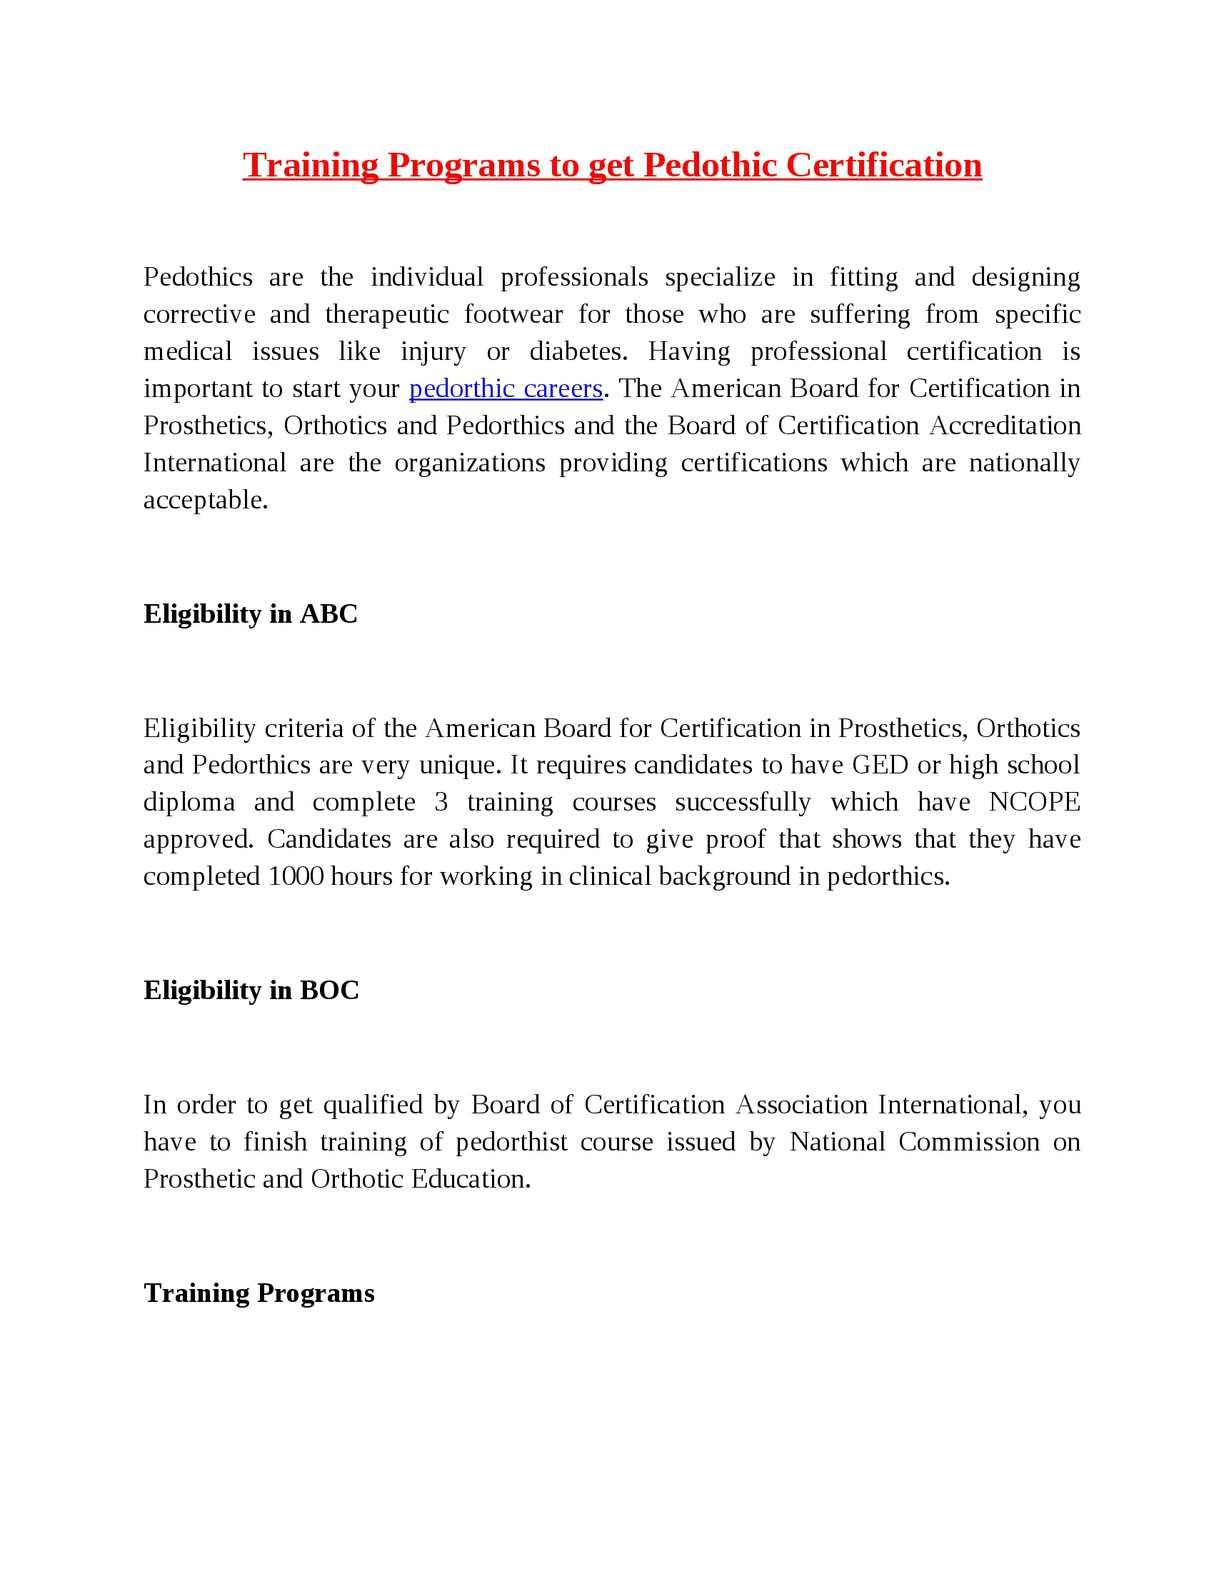 Calamo Training Programs To Get Pedothic Certification